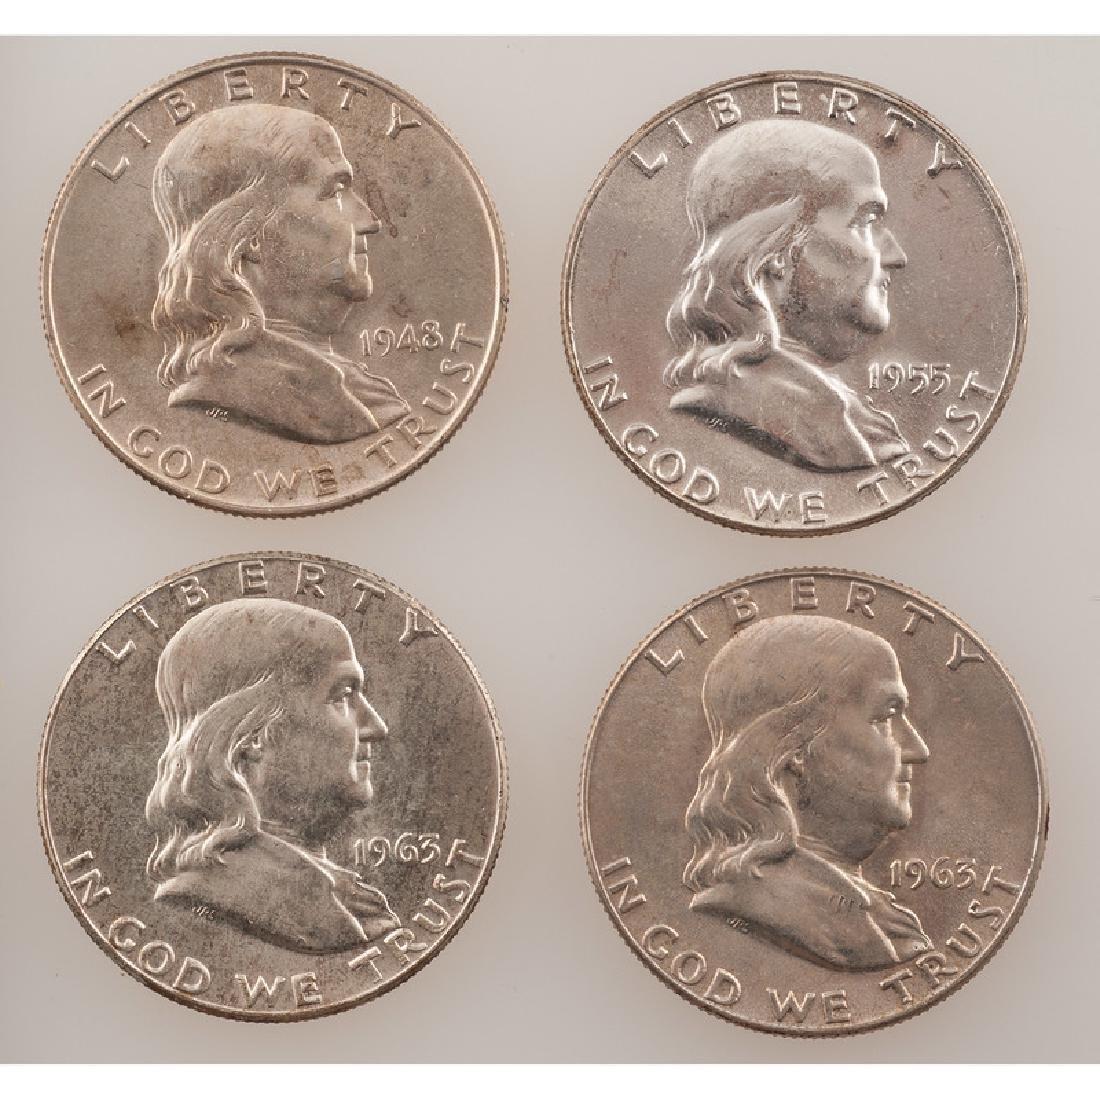 United States Franklin Half Dollars 1948-1963